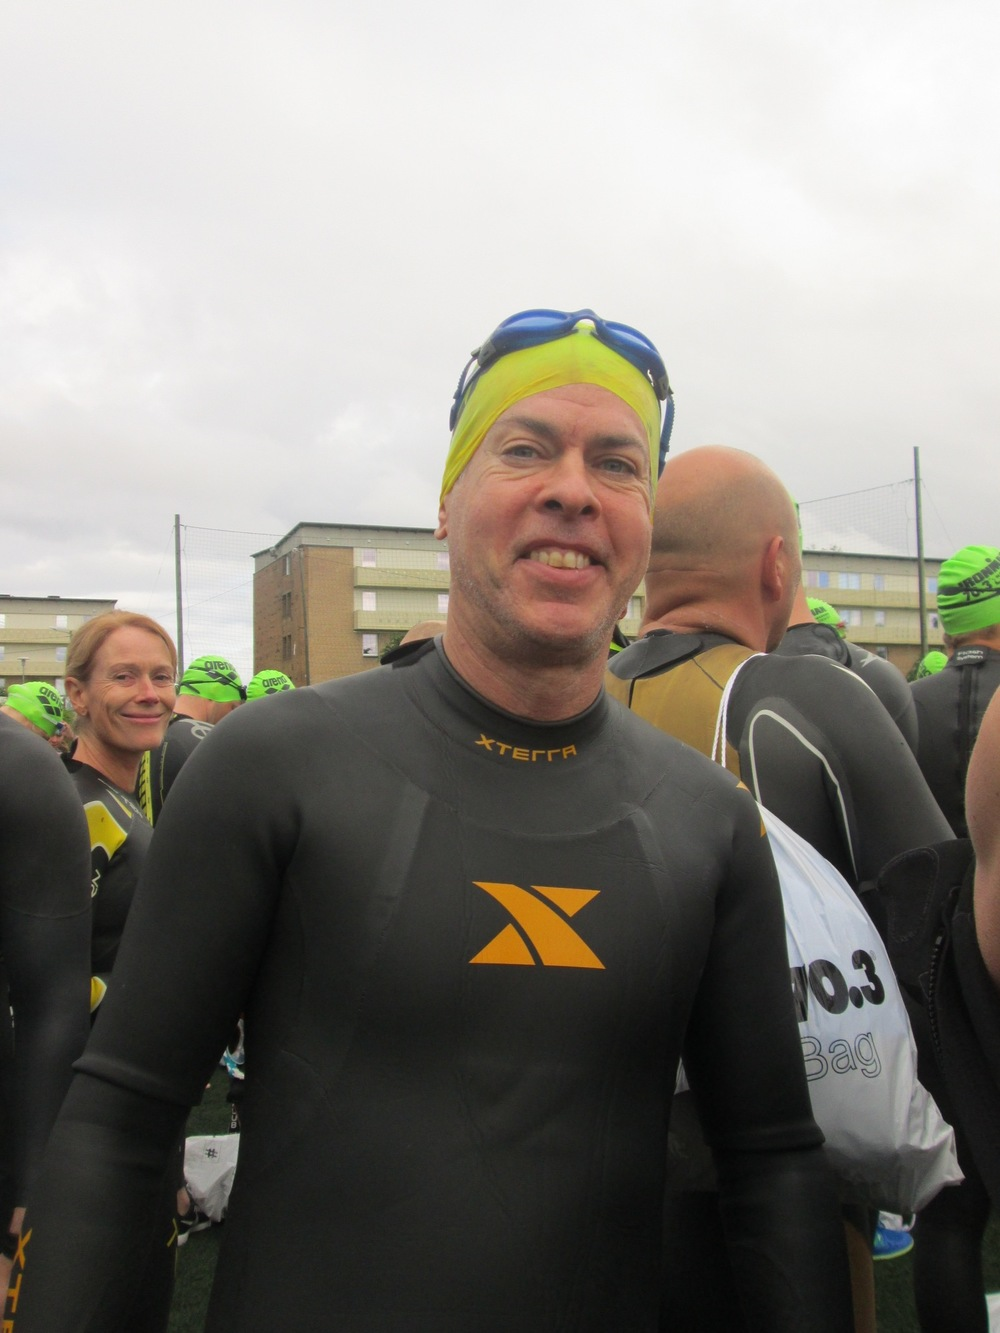 David at the Ironman Norway swim start